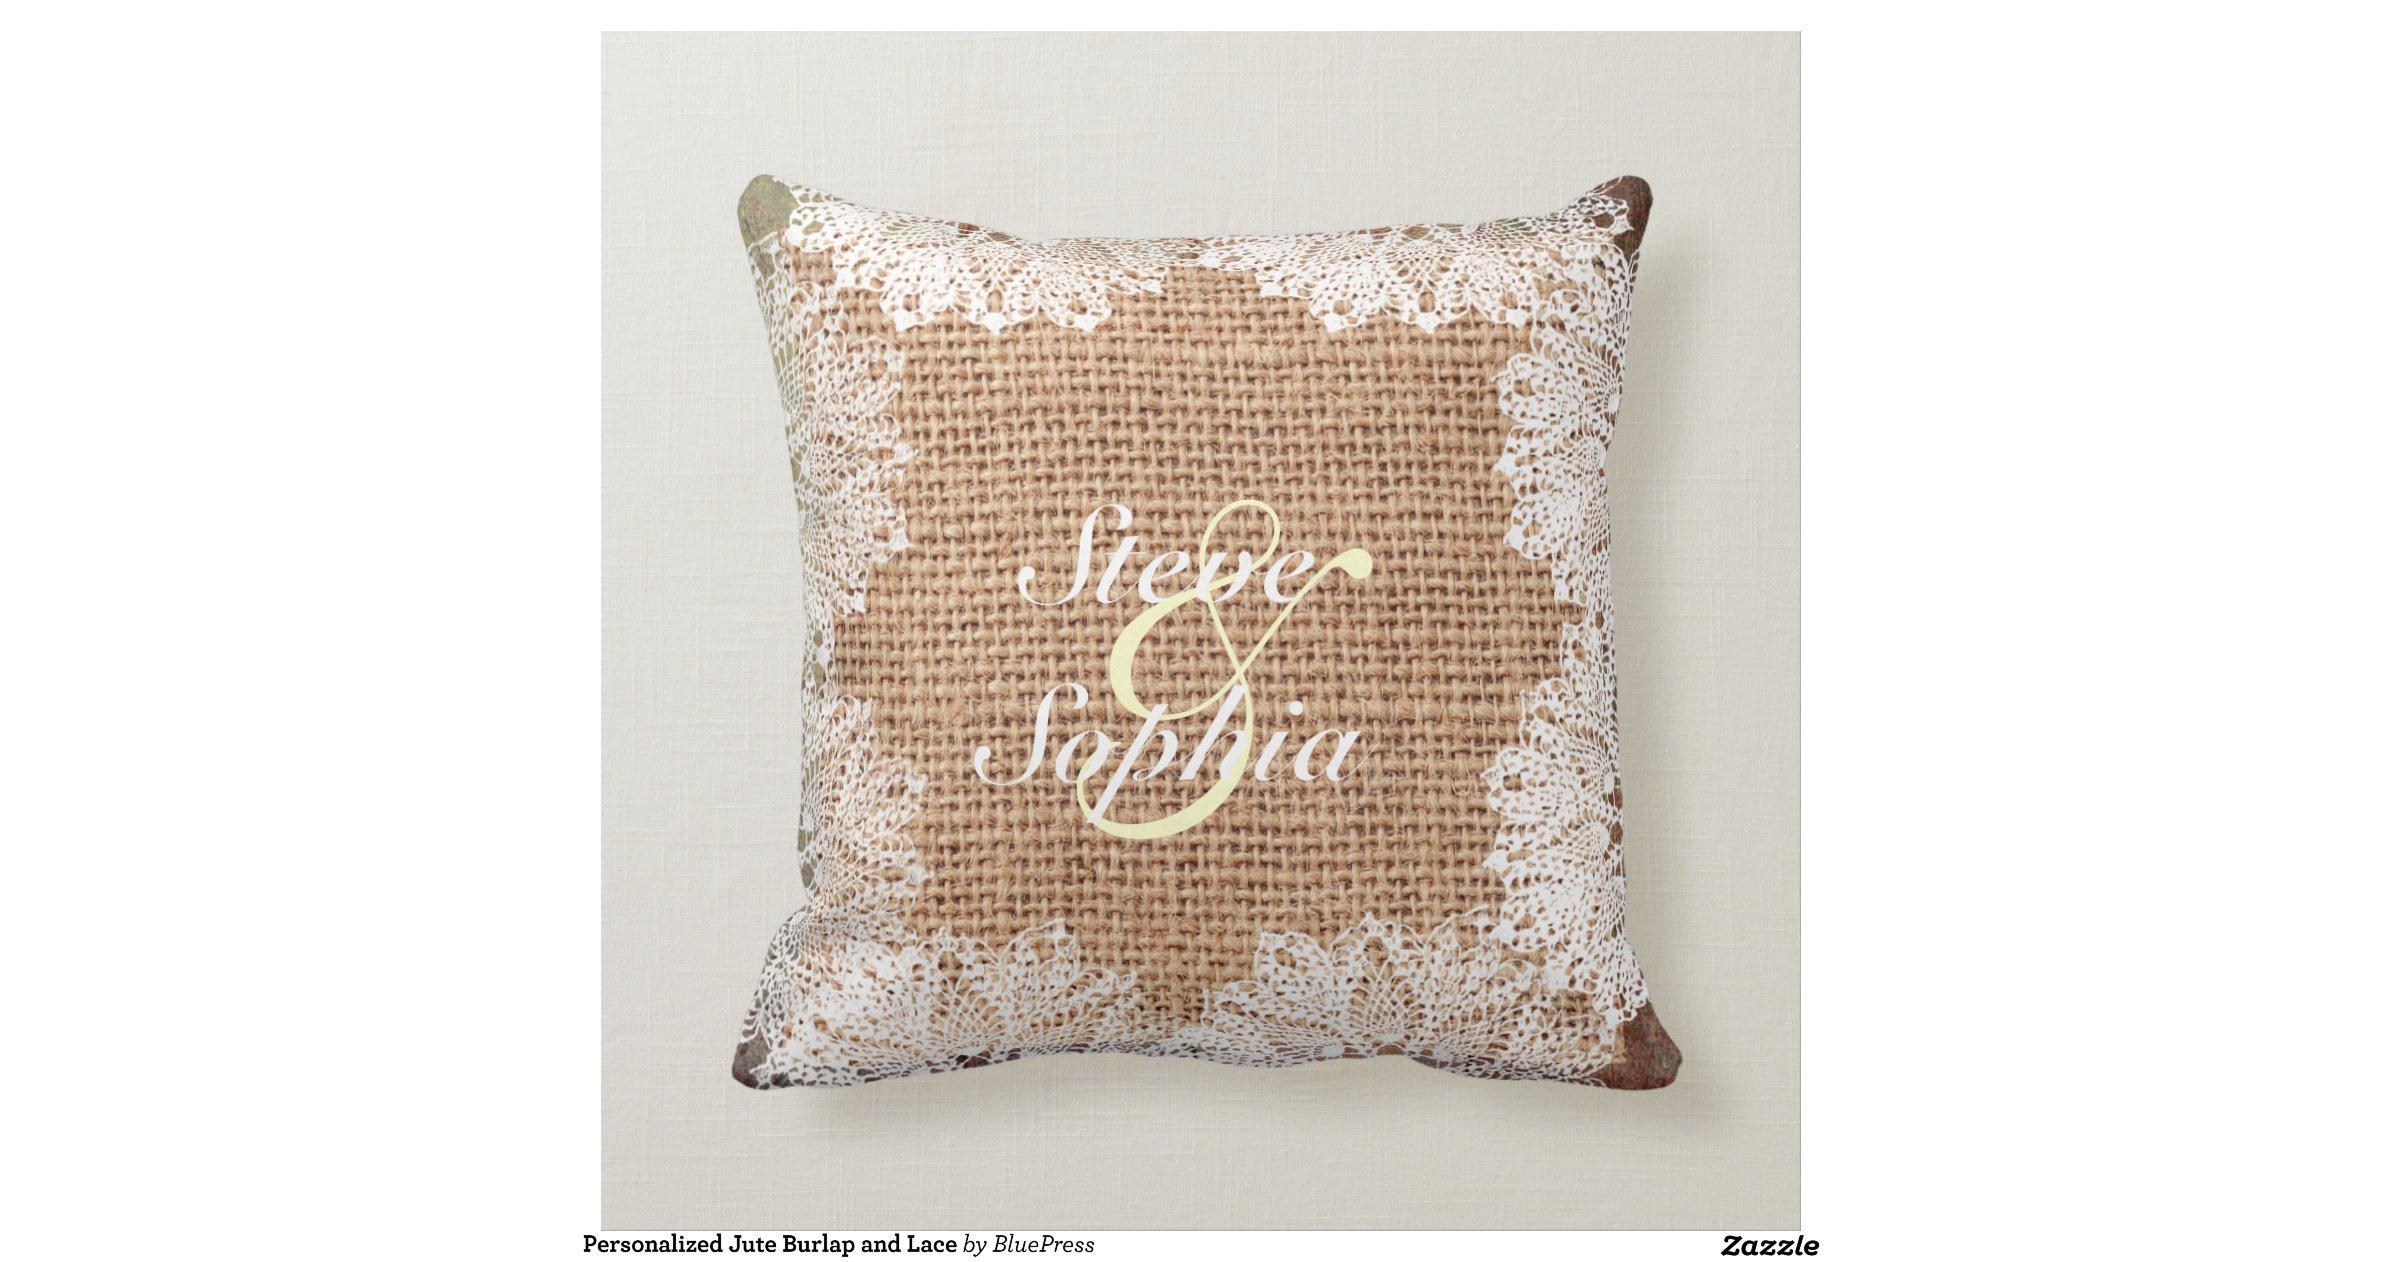 Jute Decorative Pillows : Personalized Jute Burlap and Lace Throw Pillows Zazzle